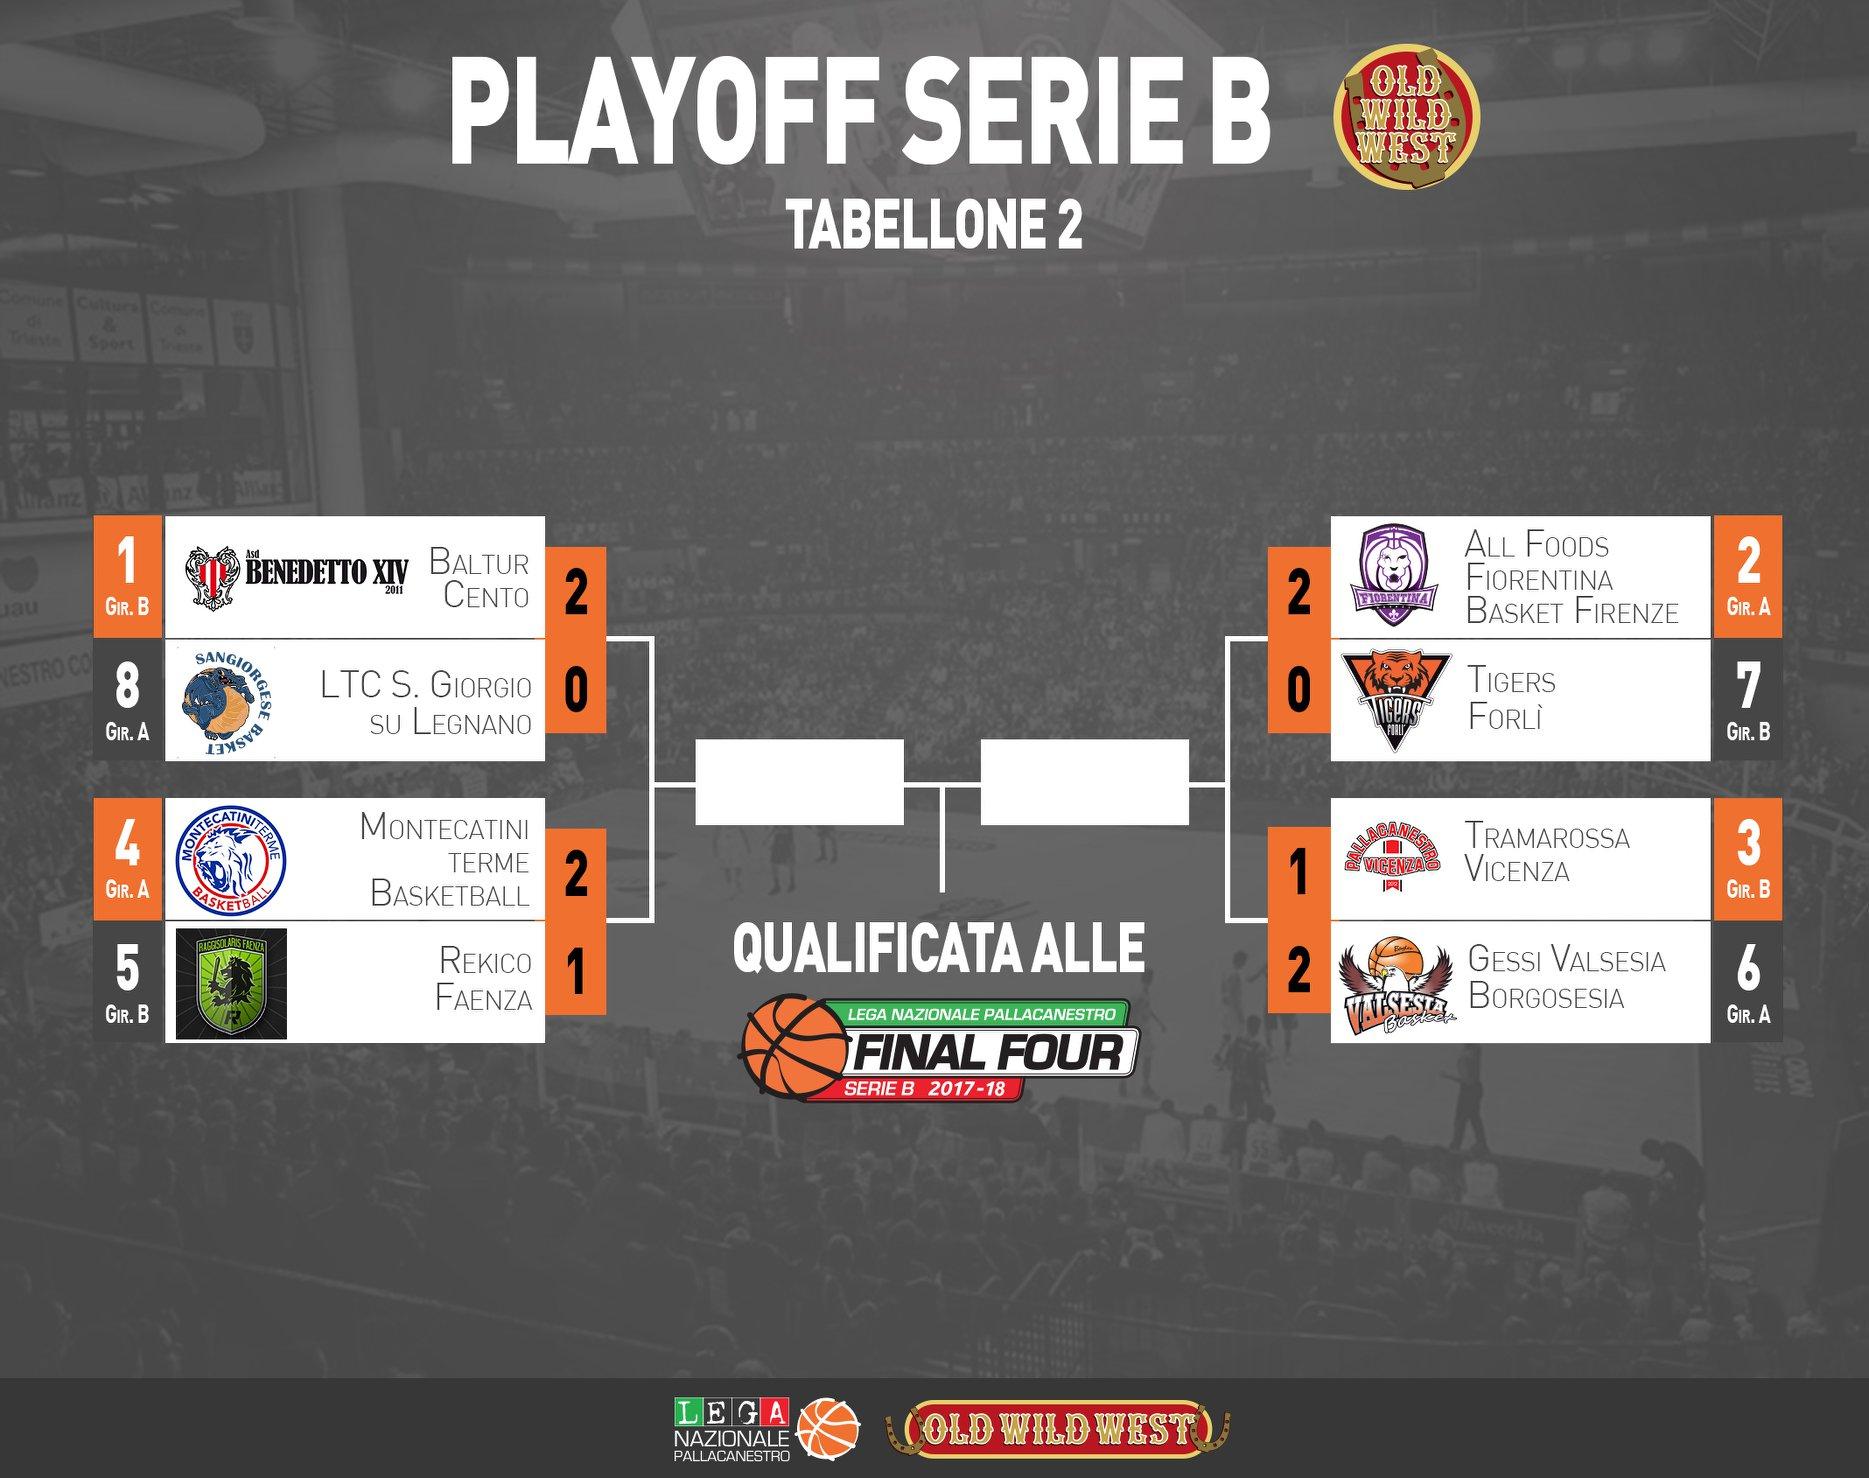 playoff_serieB2017-18_LNP